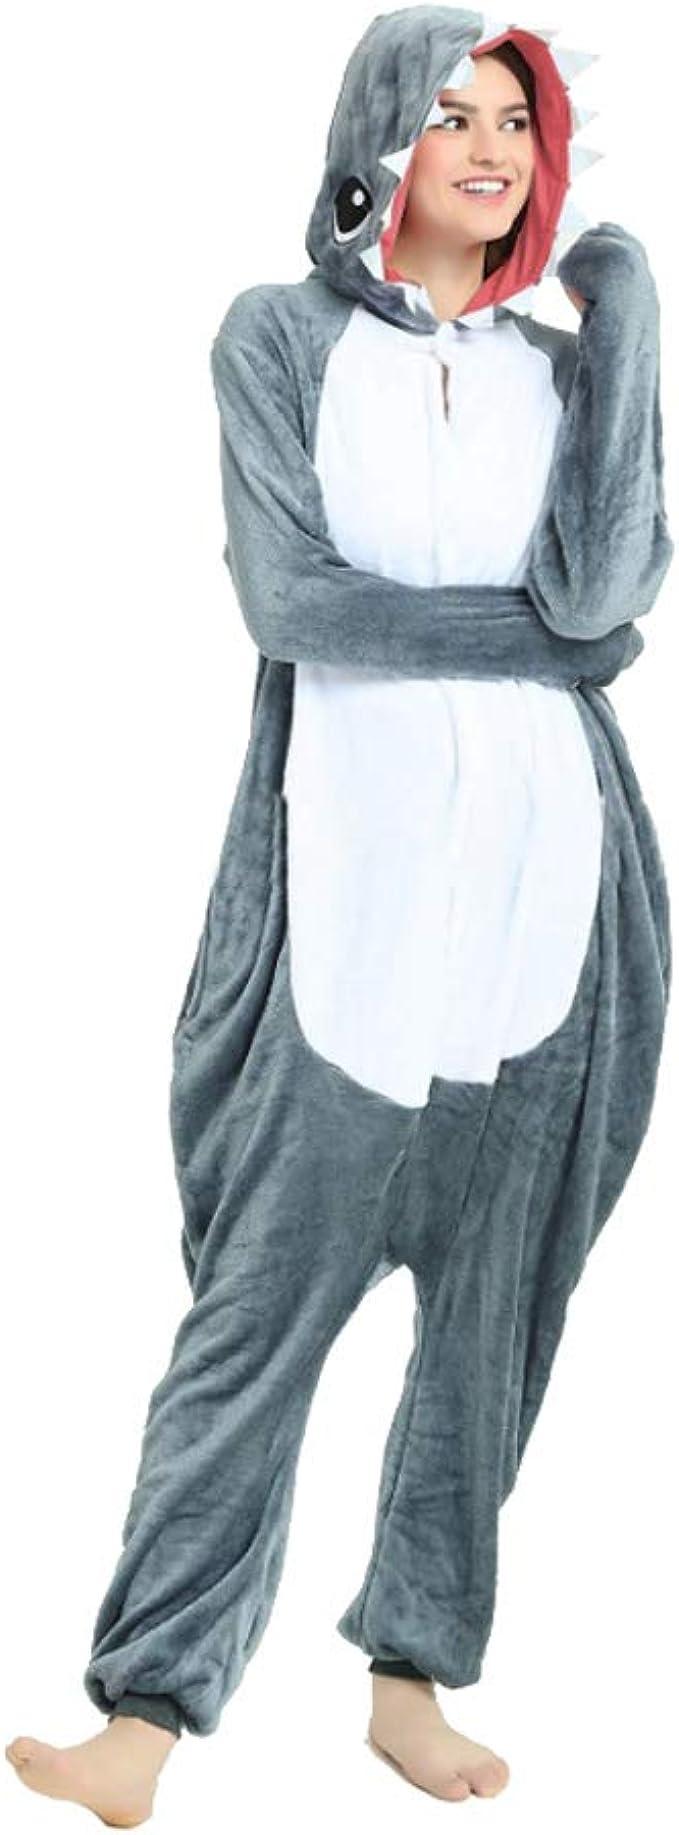 Aoibox Unisex Adult Plush Onesies One Piece Animal Cosplay Costume Pajamas